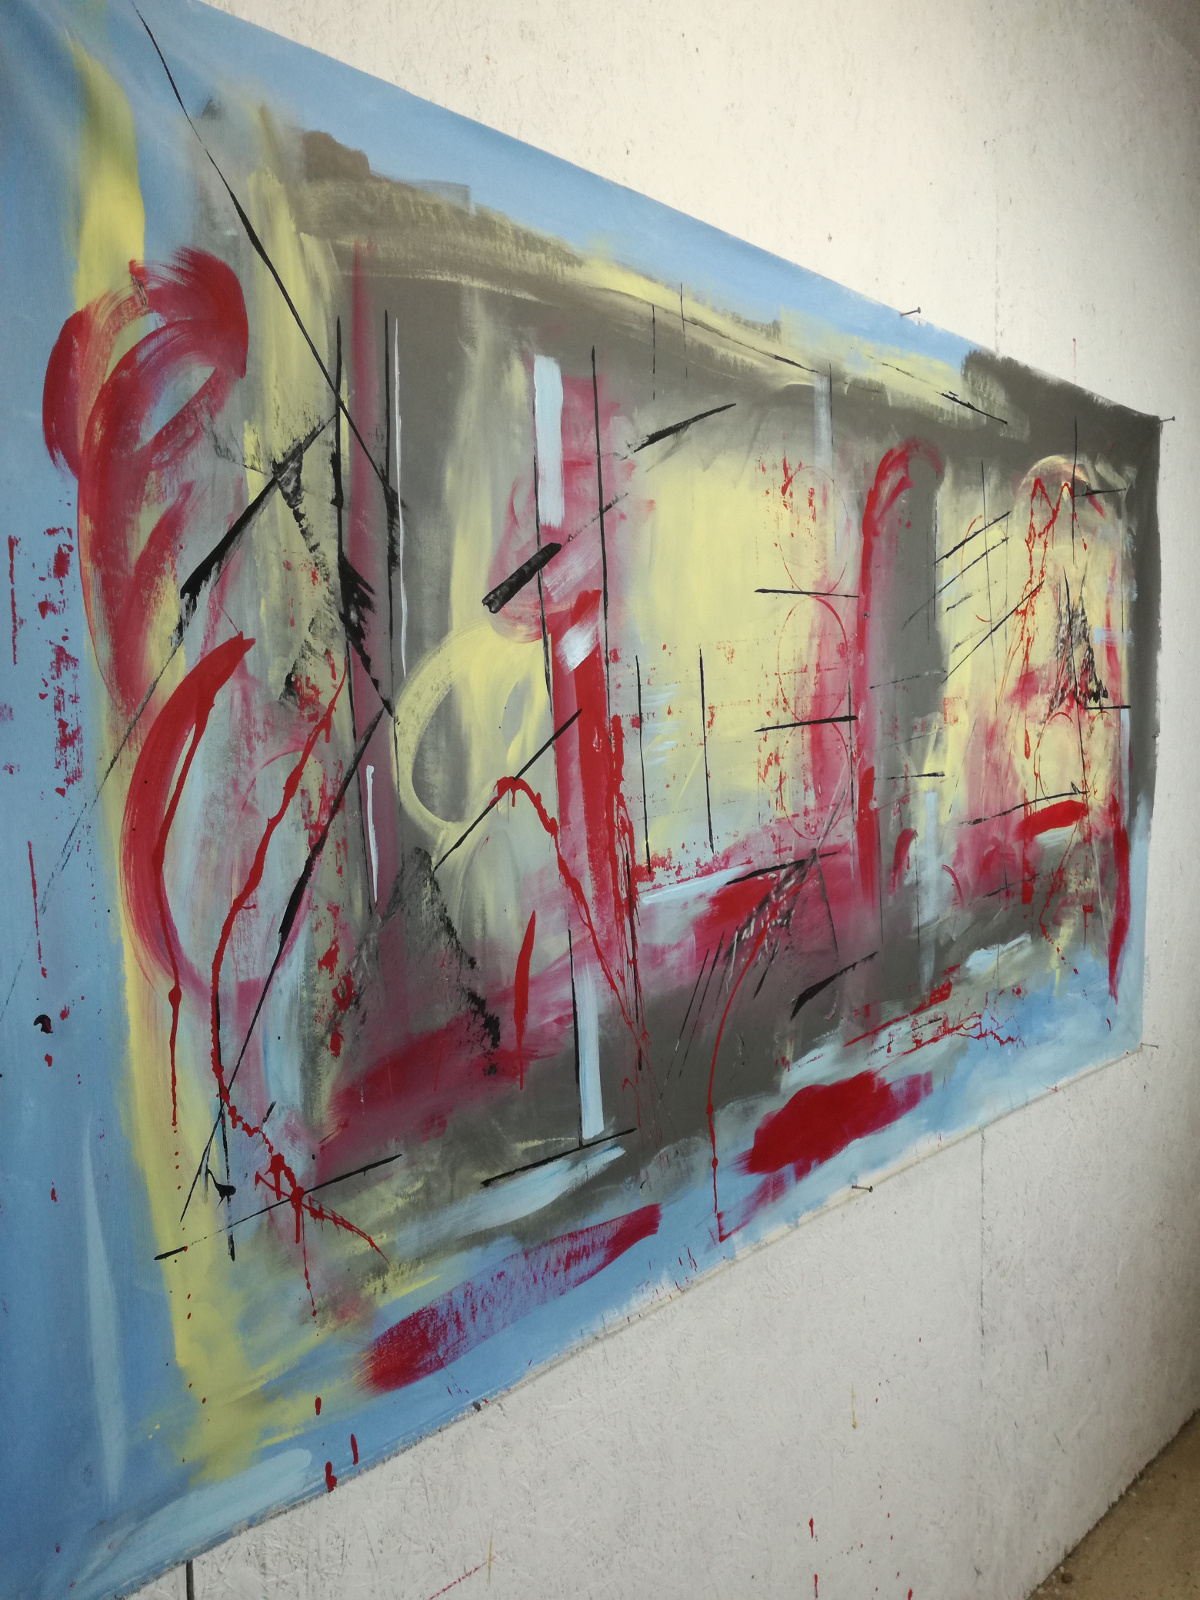 quadri giganti moderni b36.jpg - dipinti moderni giganti 180x90 per soggiorno